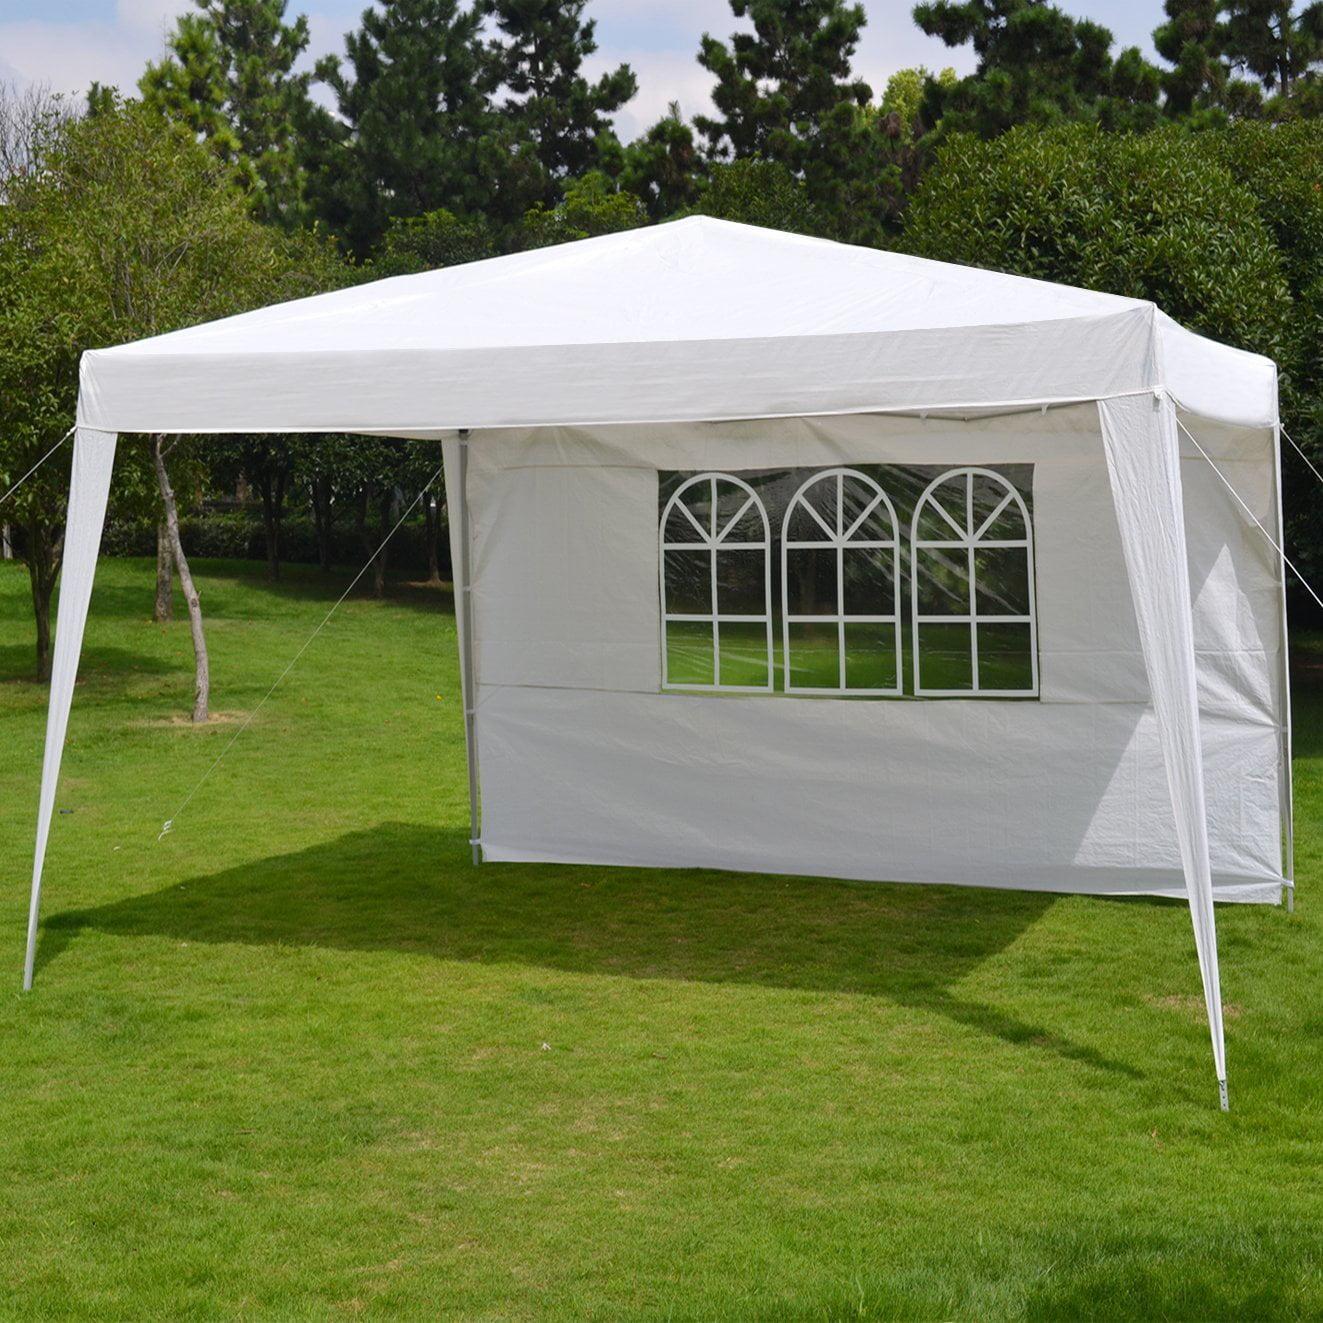 10'X13'EZ POP UP Folding Gazebo Camping Canopy W/Carry Bag Wedding